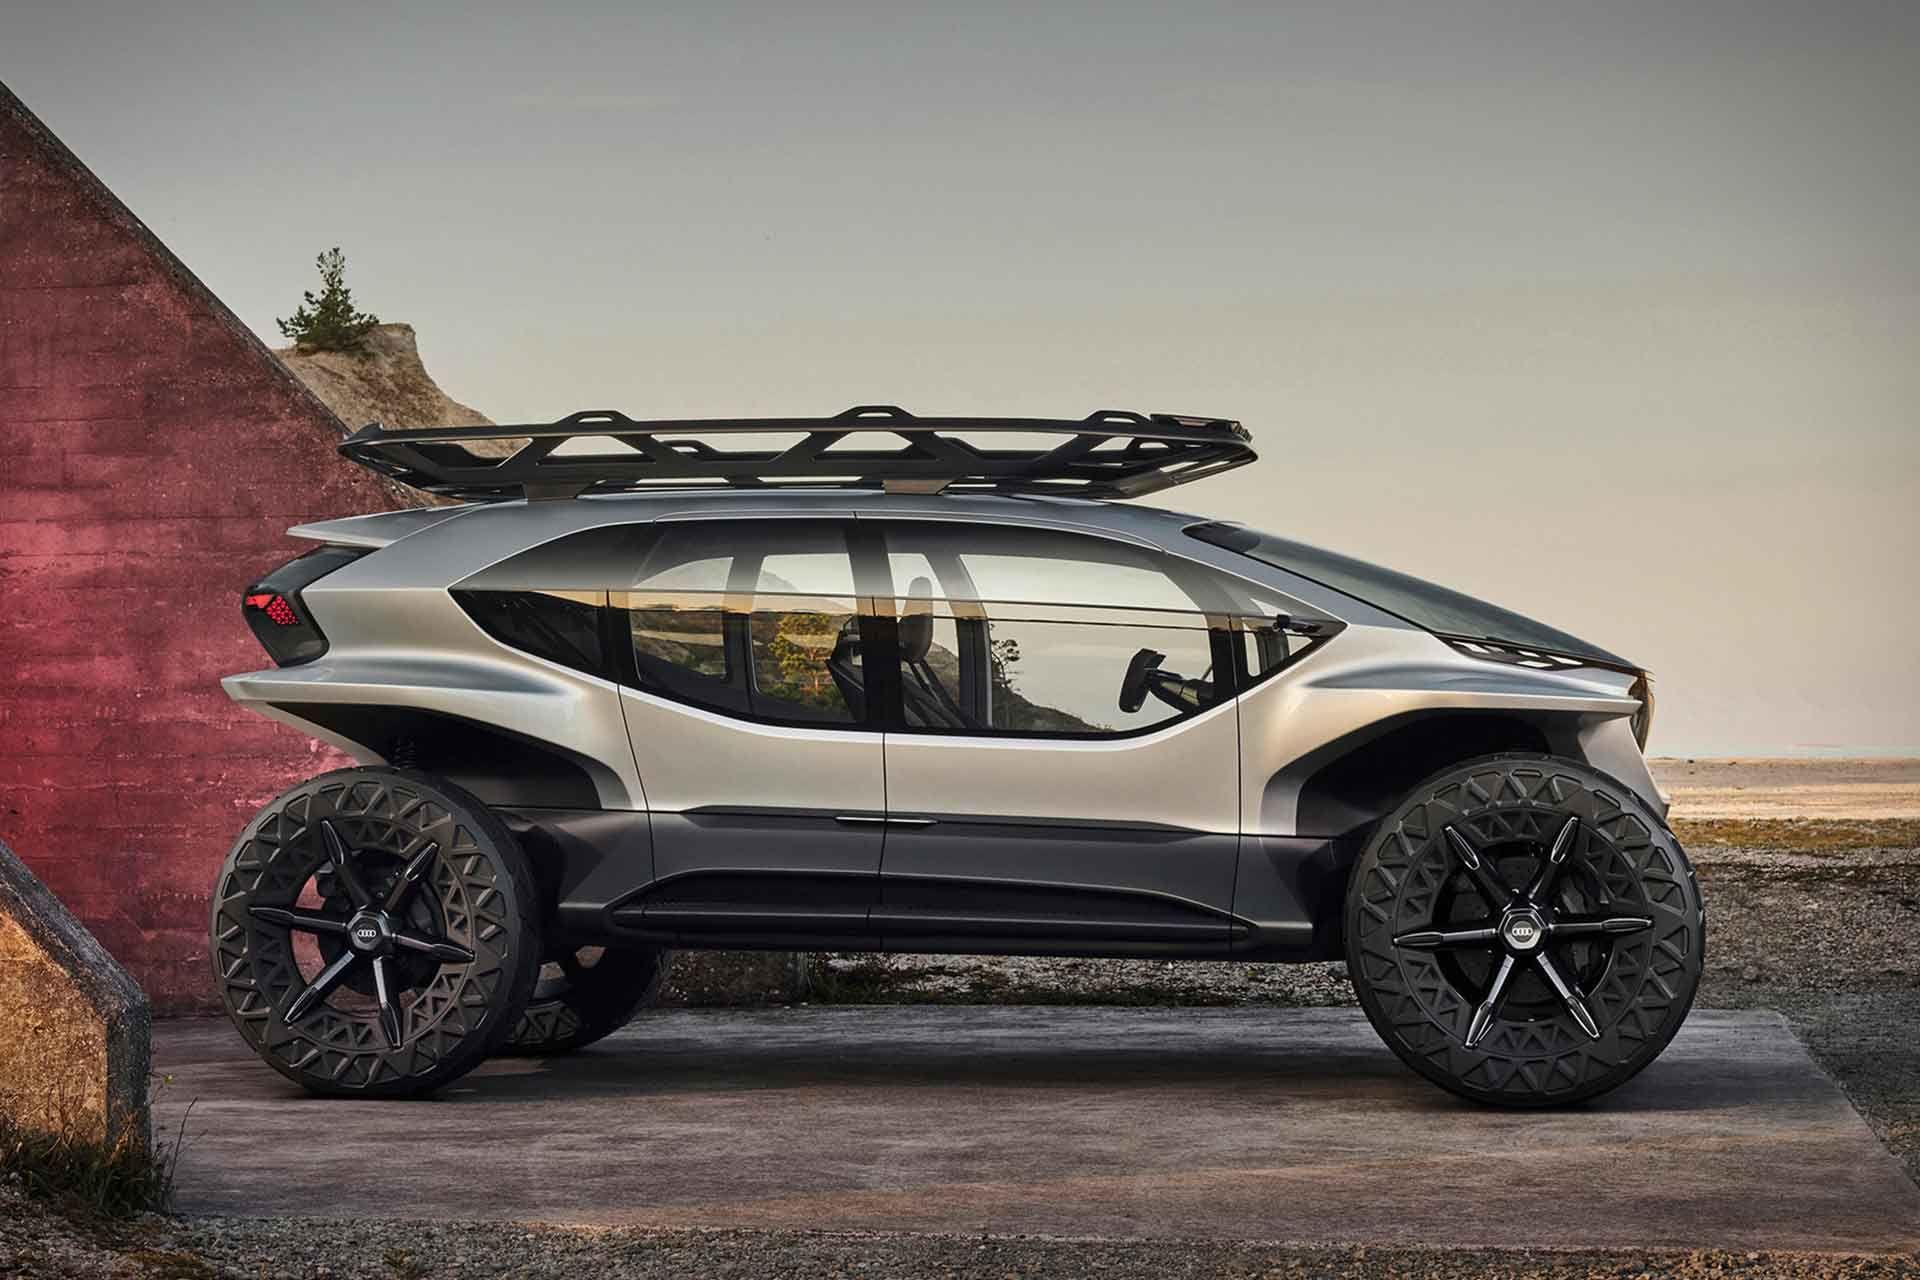 Audi AI:Trail Quattro Concept SUV | Concept cars, Audi, Vehicles